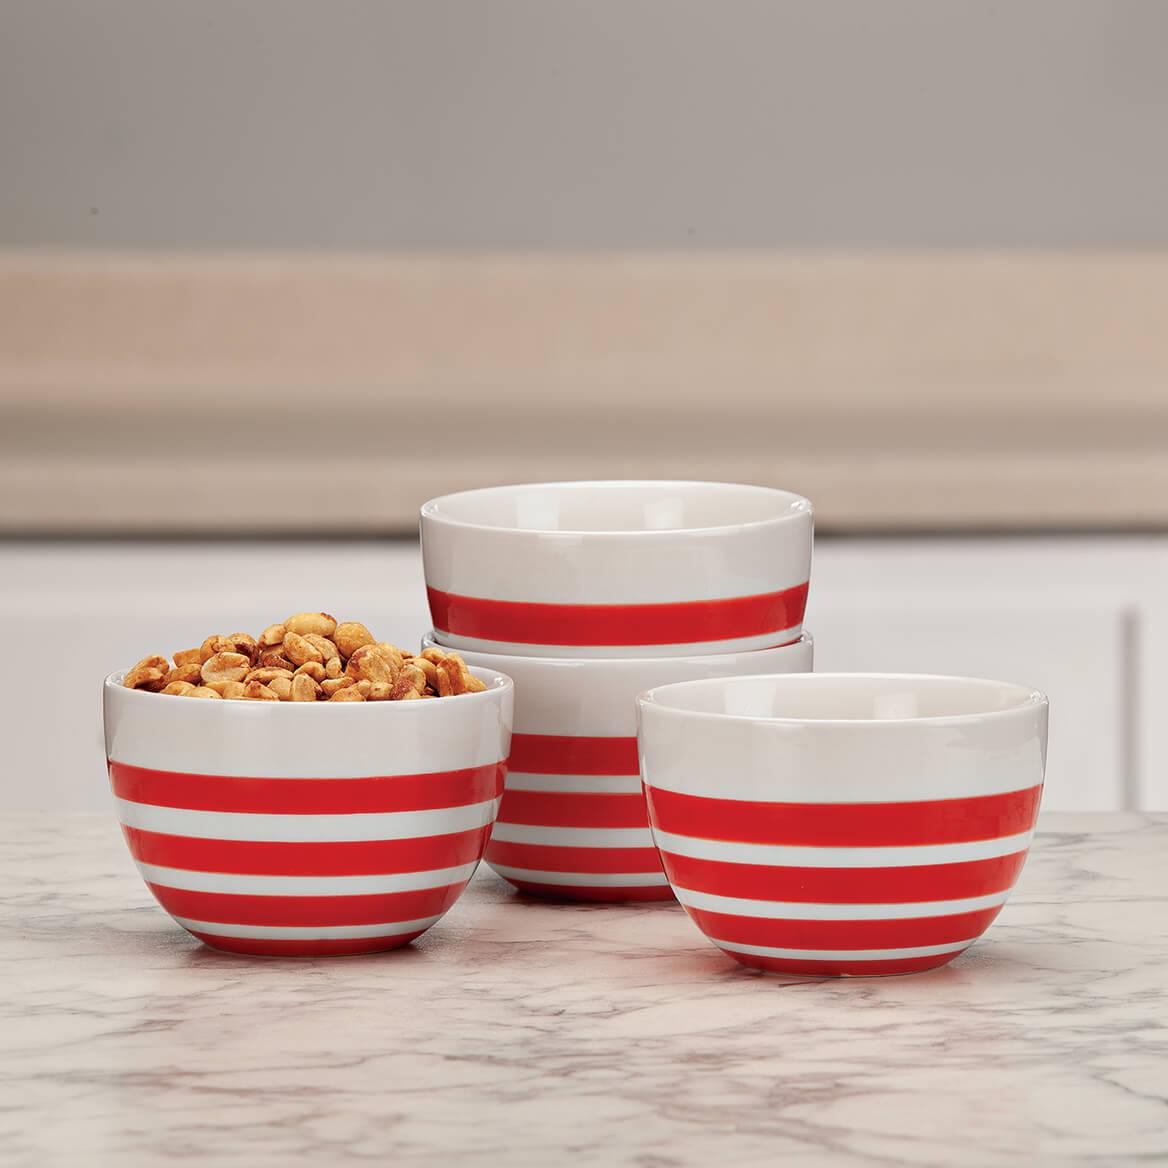 All-Purpose Ceramic Bowls, Set of 4-370743